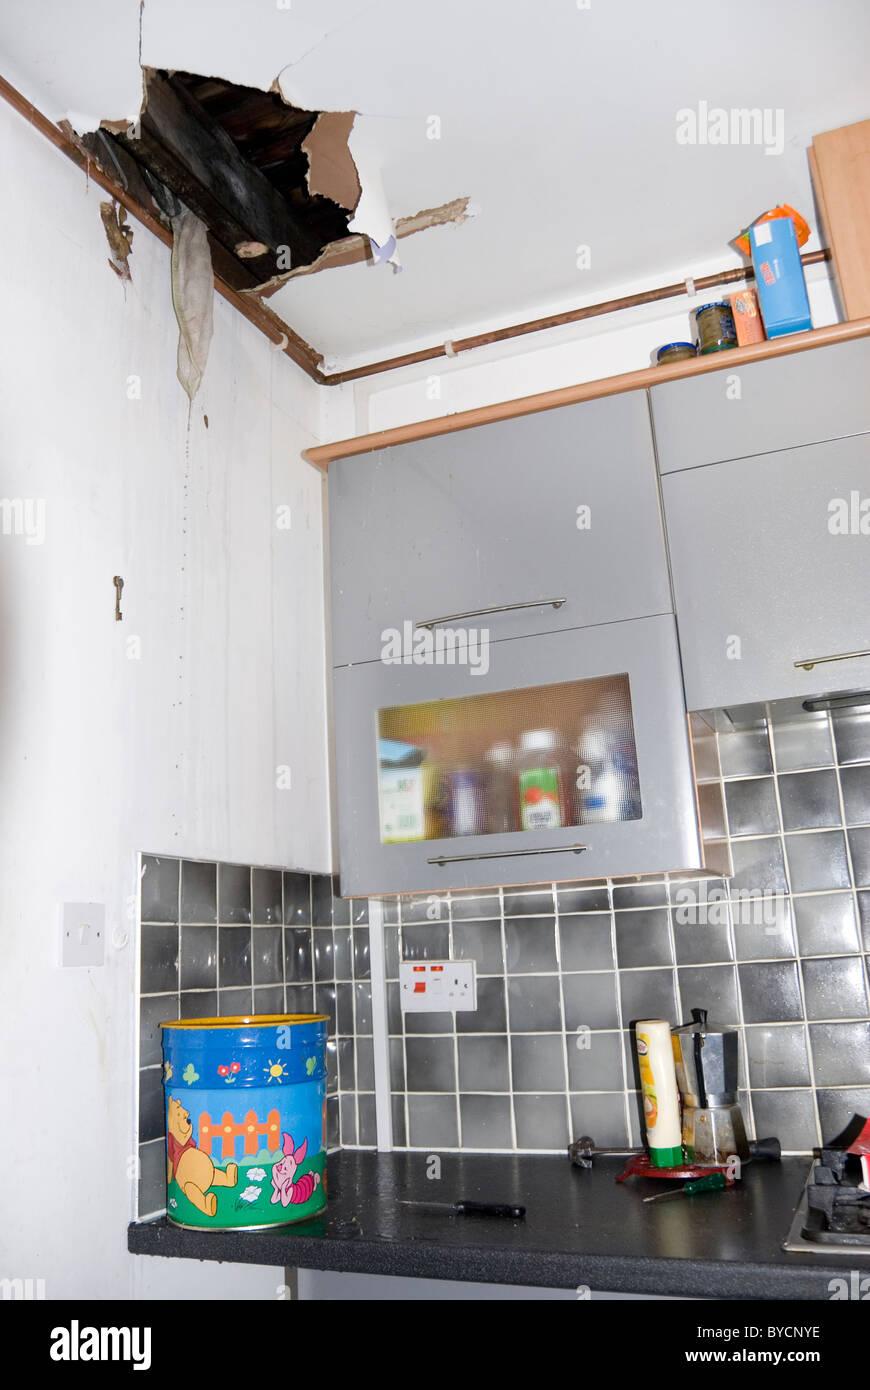 Leaking Pipes Stockfotos & Leaking Pipes Bilder - Alamy